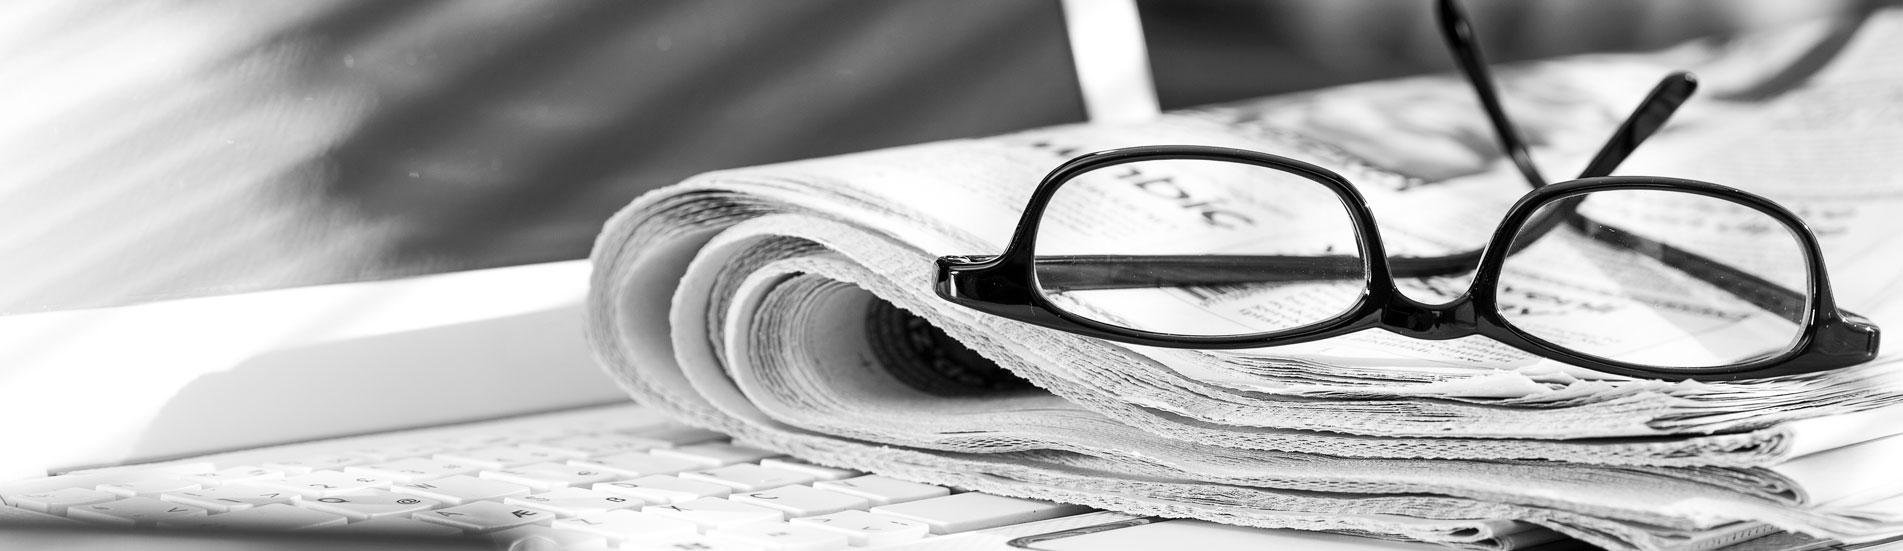 Eyal Mesika - Media and News